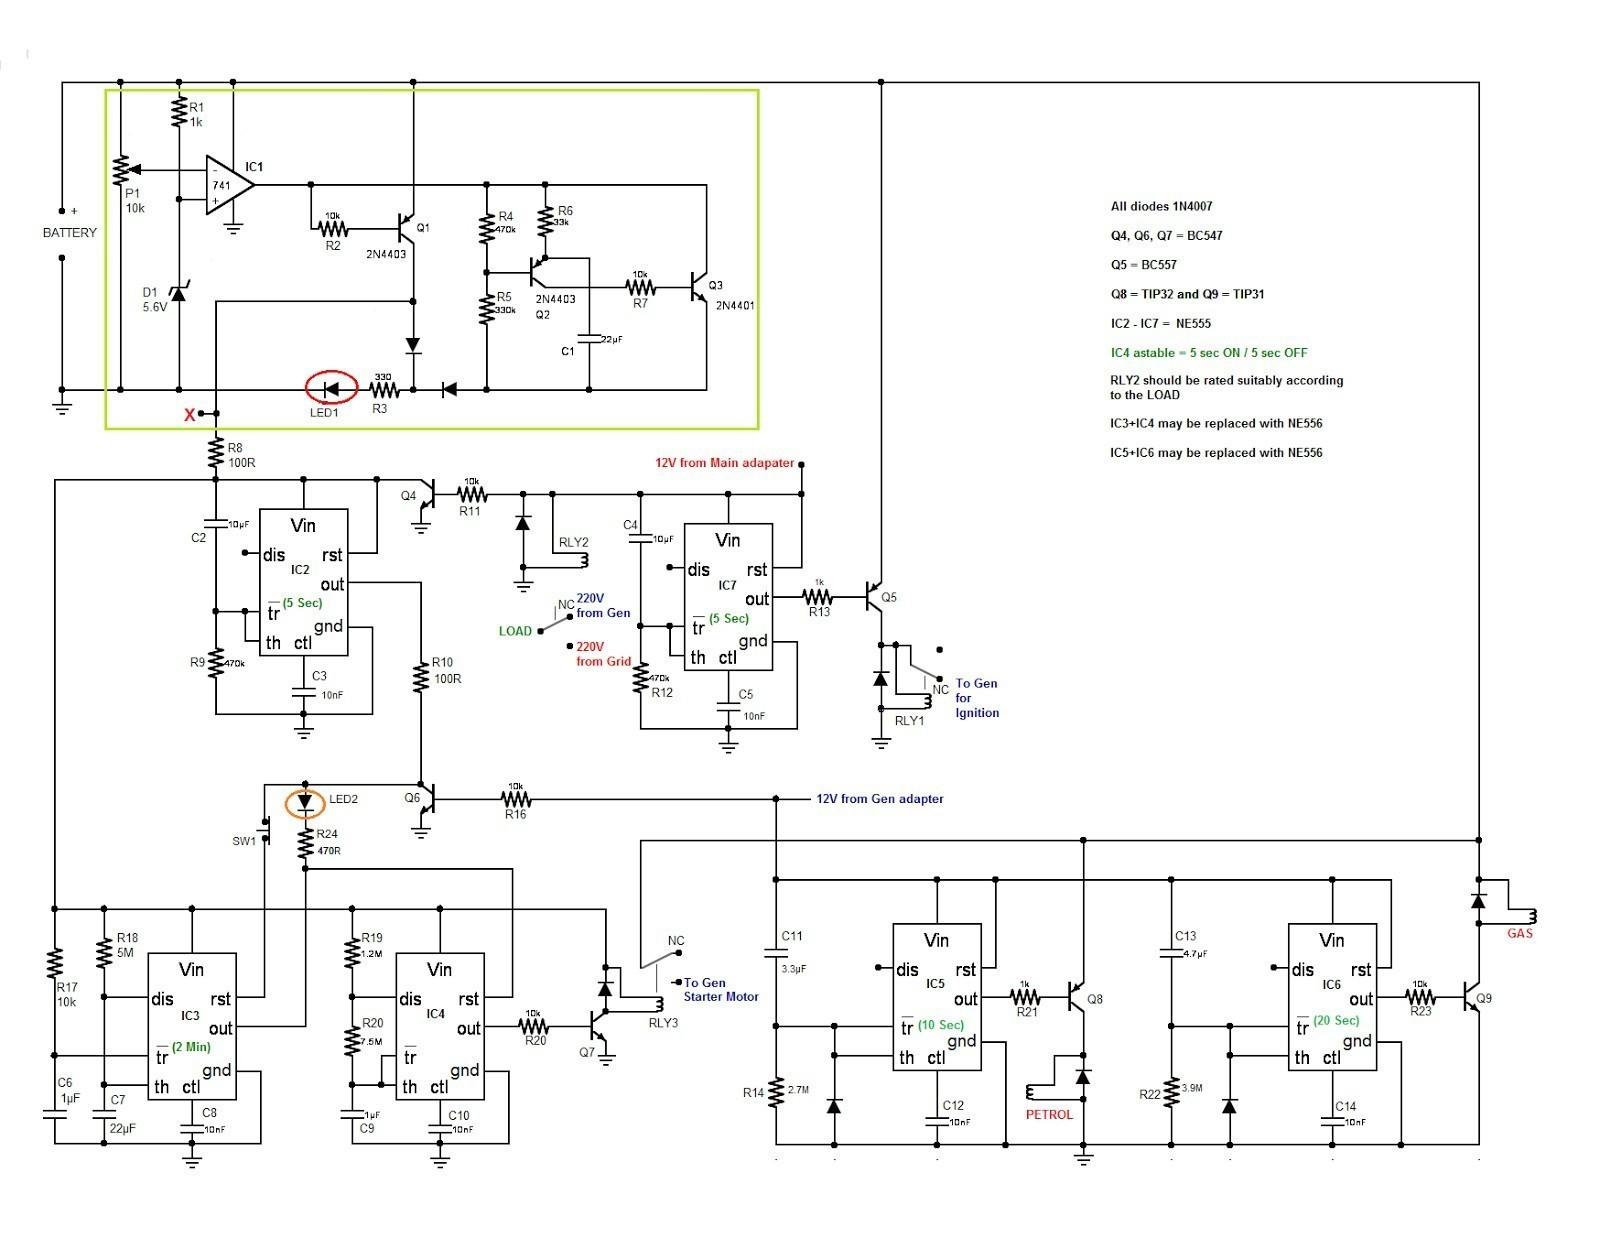 Generator Changeover Switch Wiring Diagram Wiring Diagram Generator Changeover Switch Fresh Transfer Switch Of Generator Changeover Switch Wiring Diagram